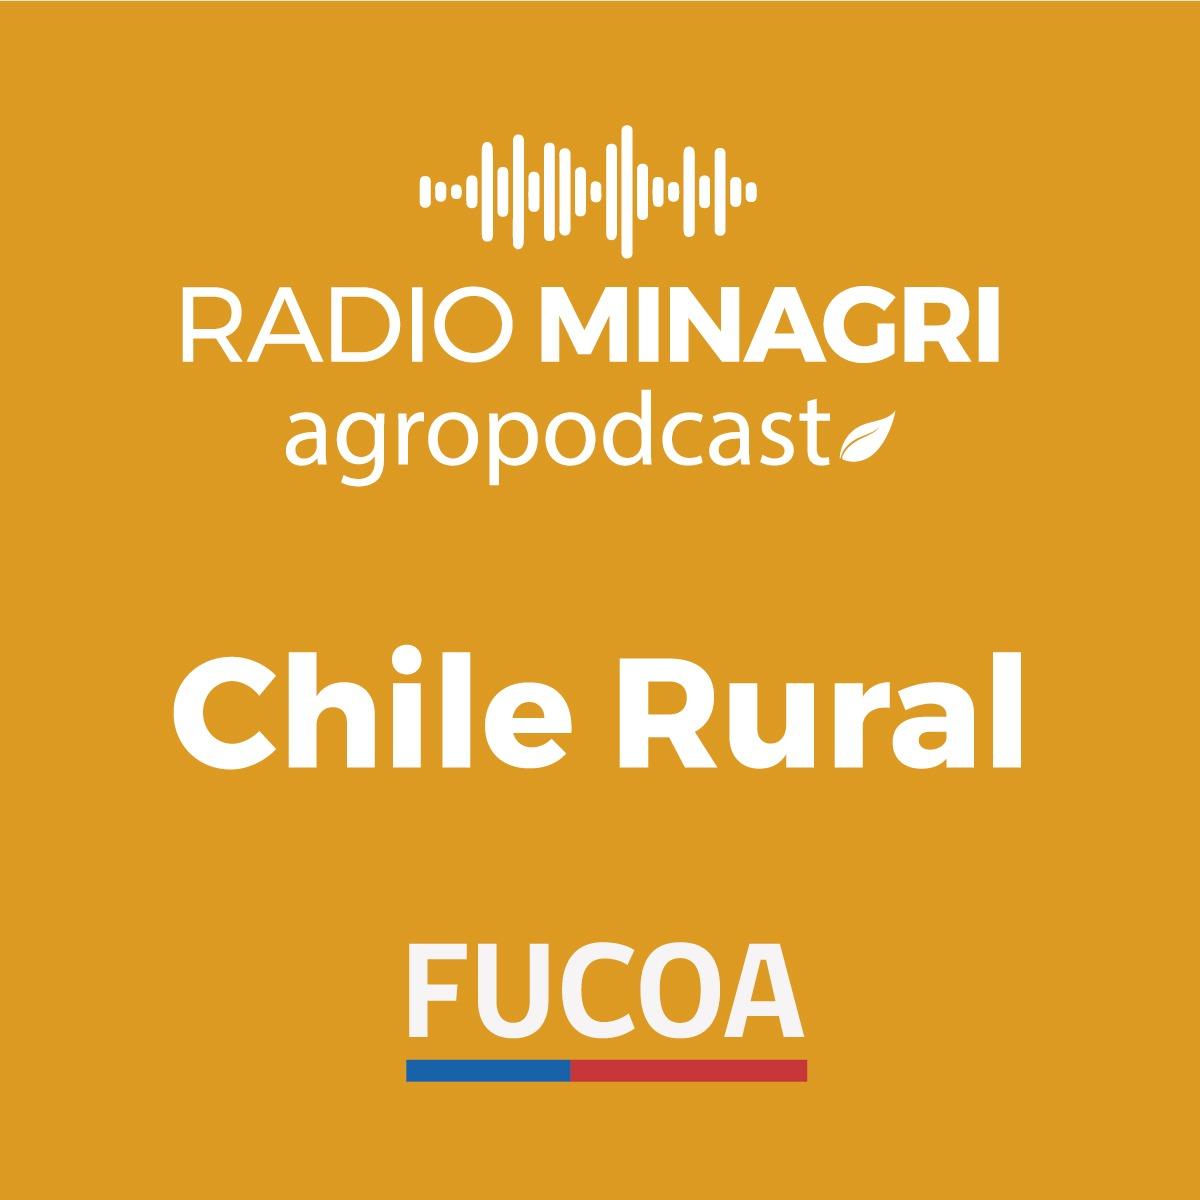 Chile Rural – Episodio 48: Cuenta Pública Participativa Minagri 2020